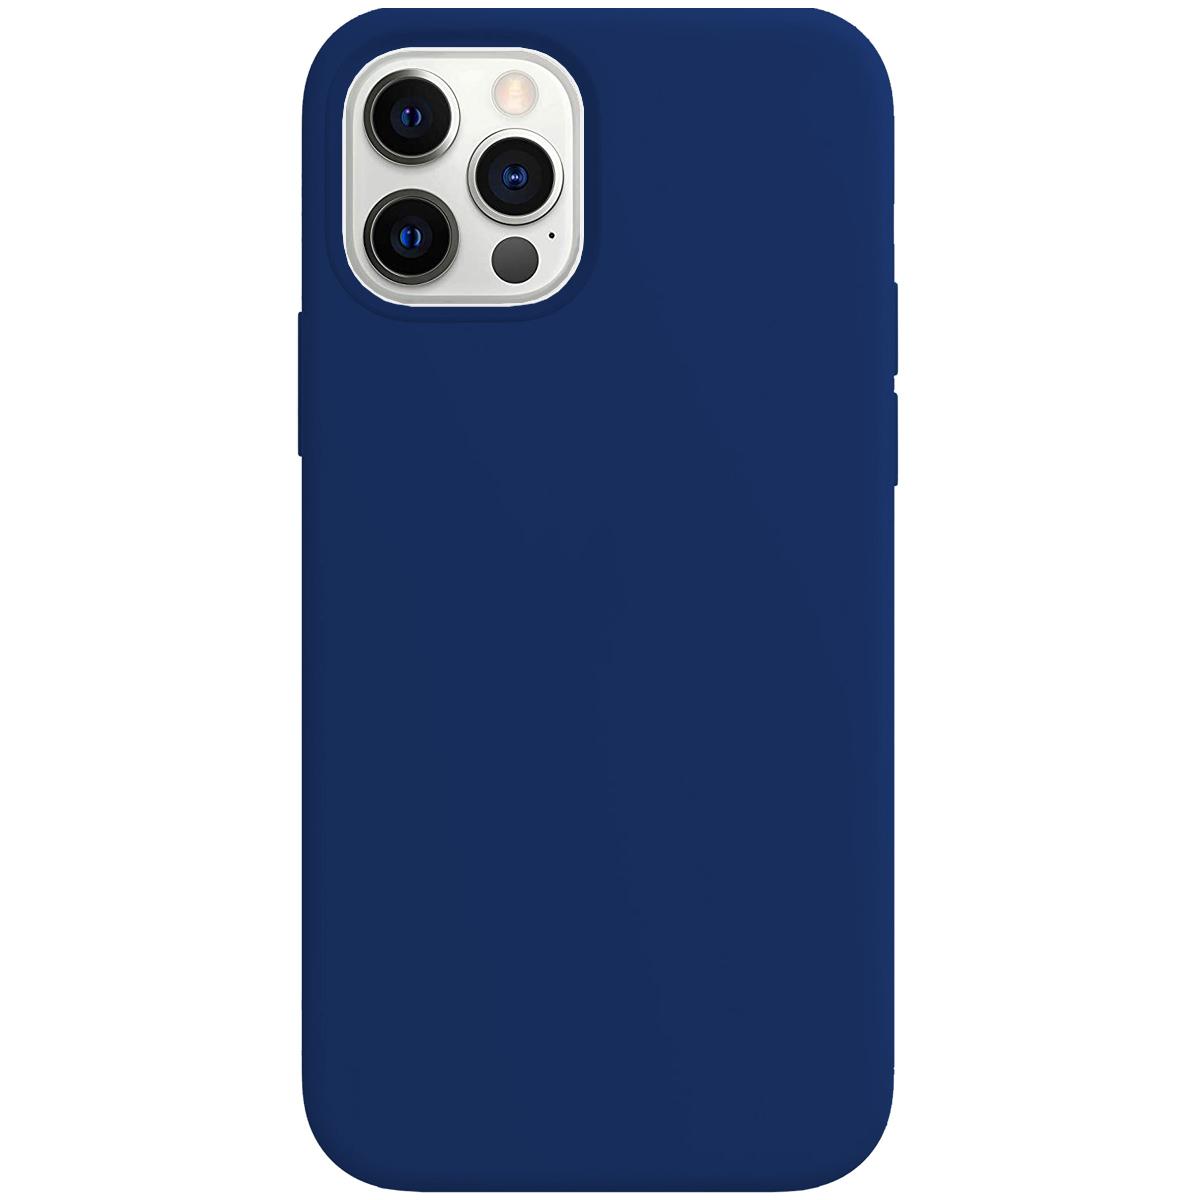 Buff iPhone 12 Pro Max Rubber S Kılıf Navy Blue